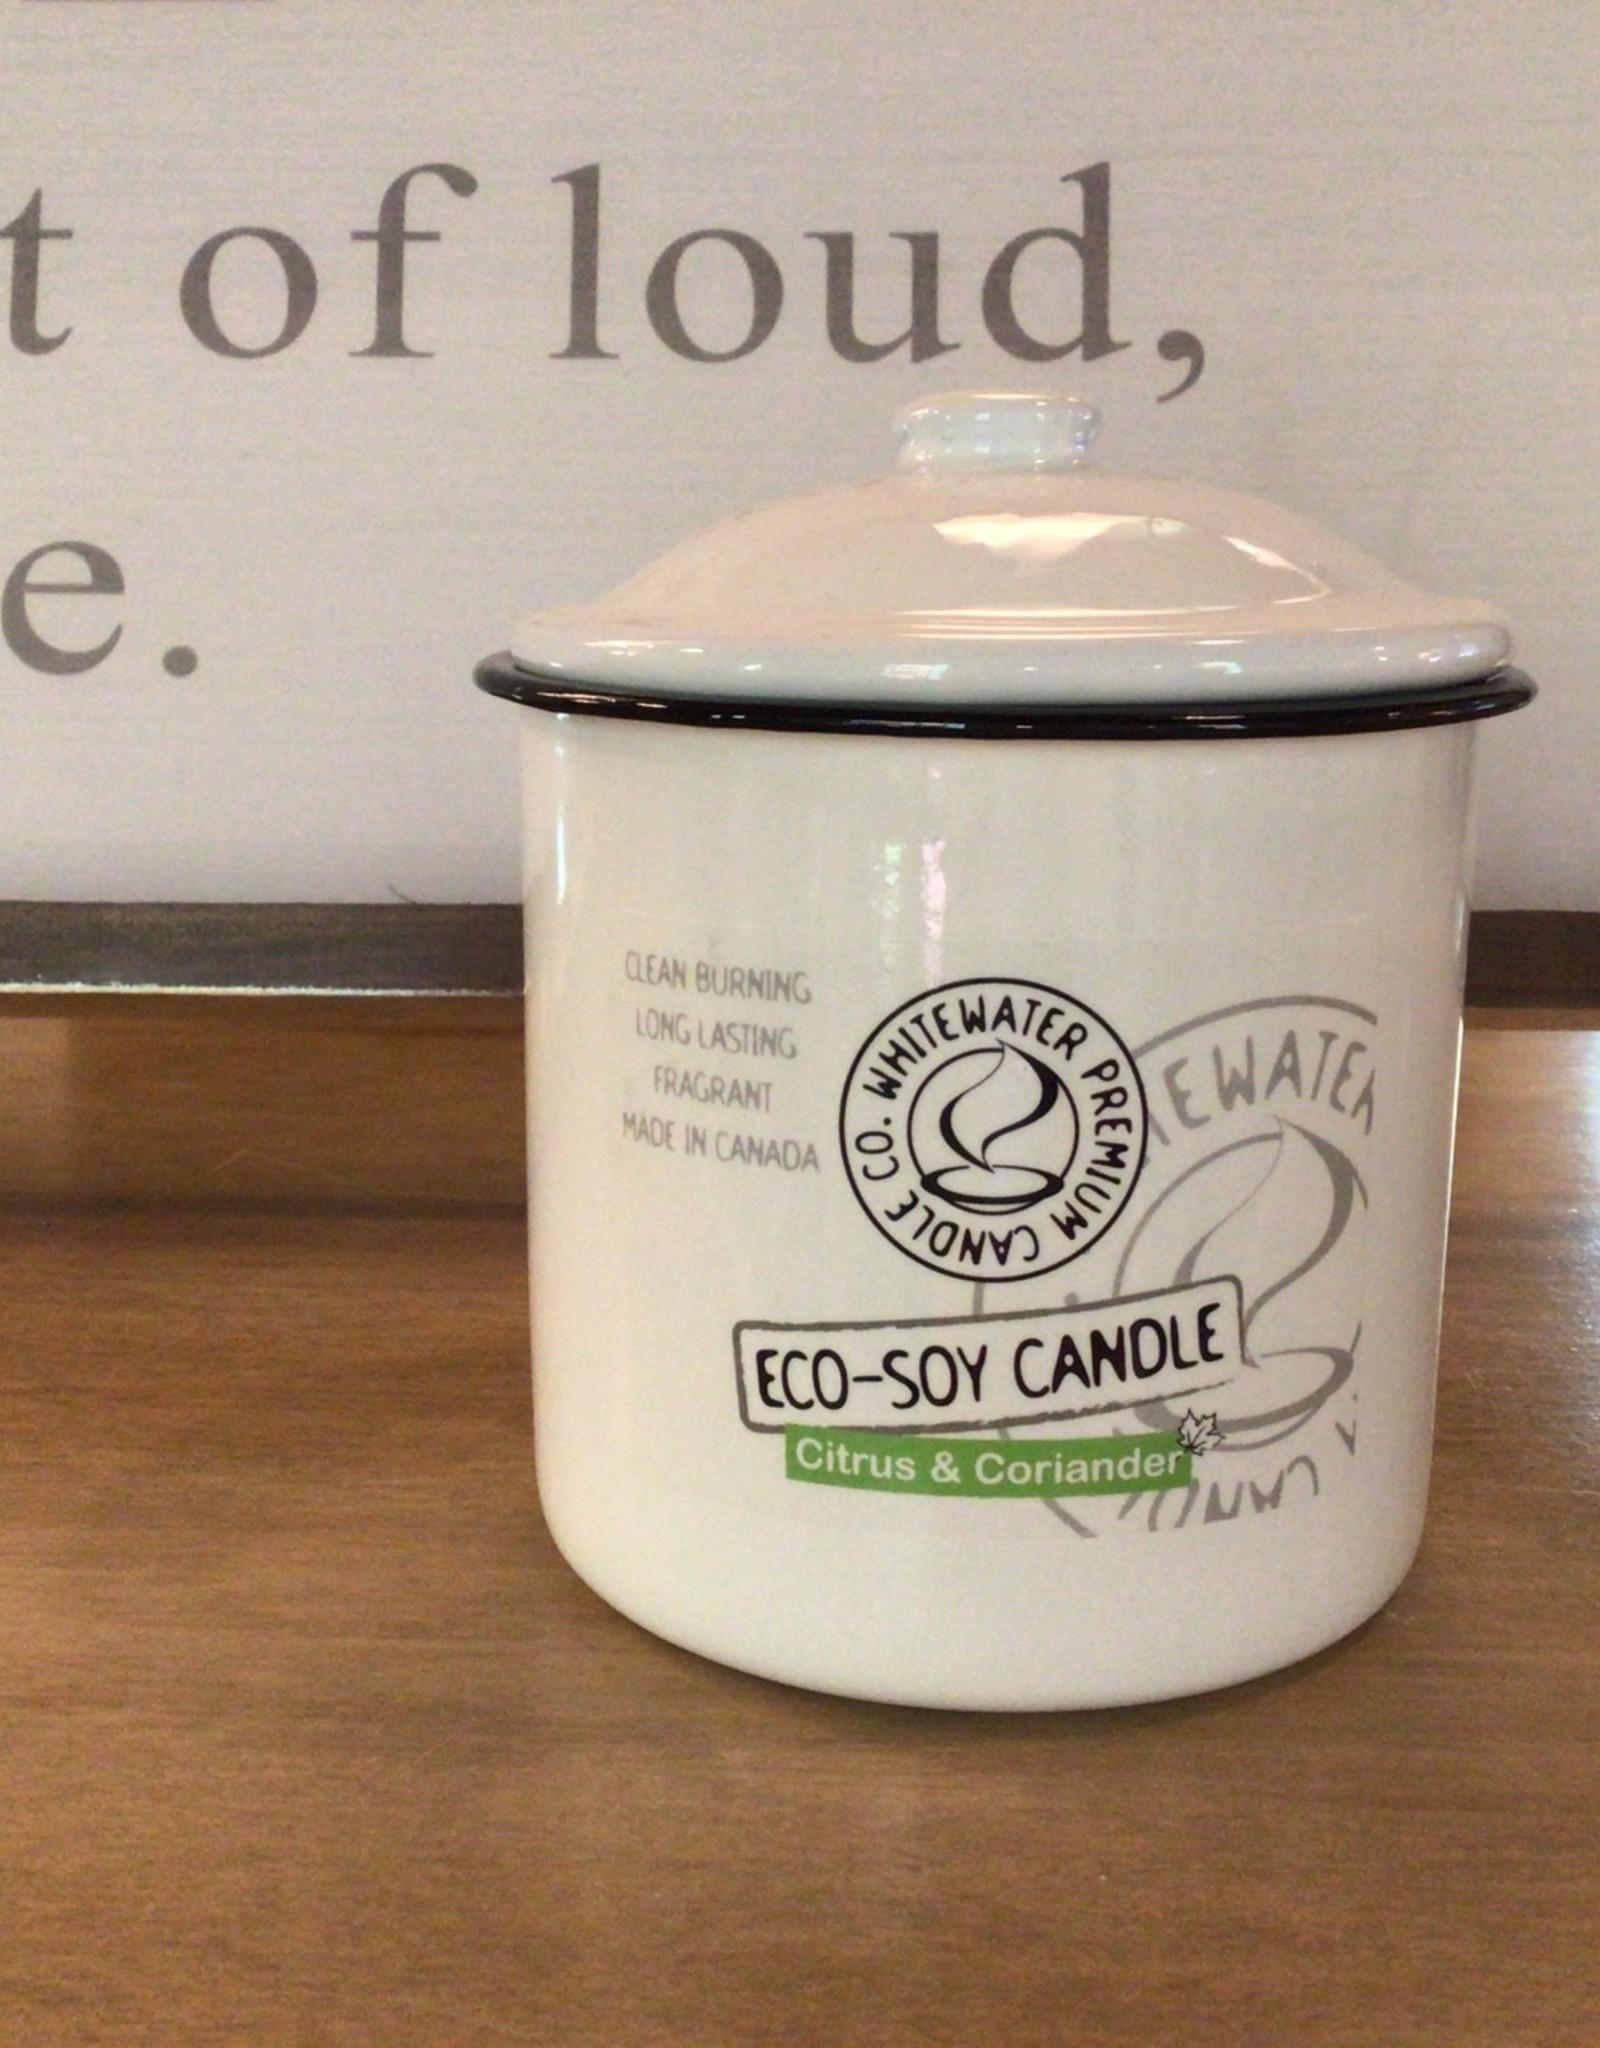 Whitewater Premium Candles Citrus & Coriander 18 oz  Candle Enamel Container